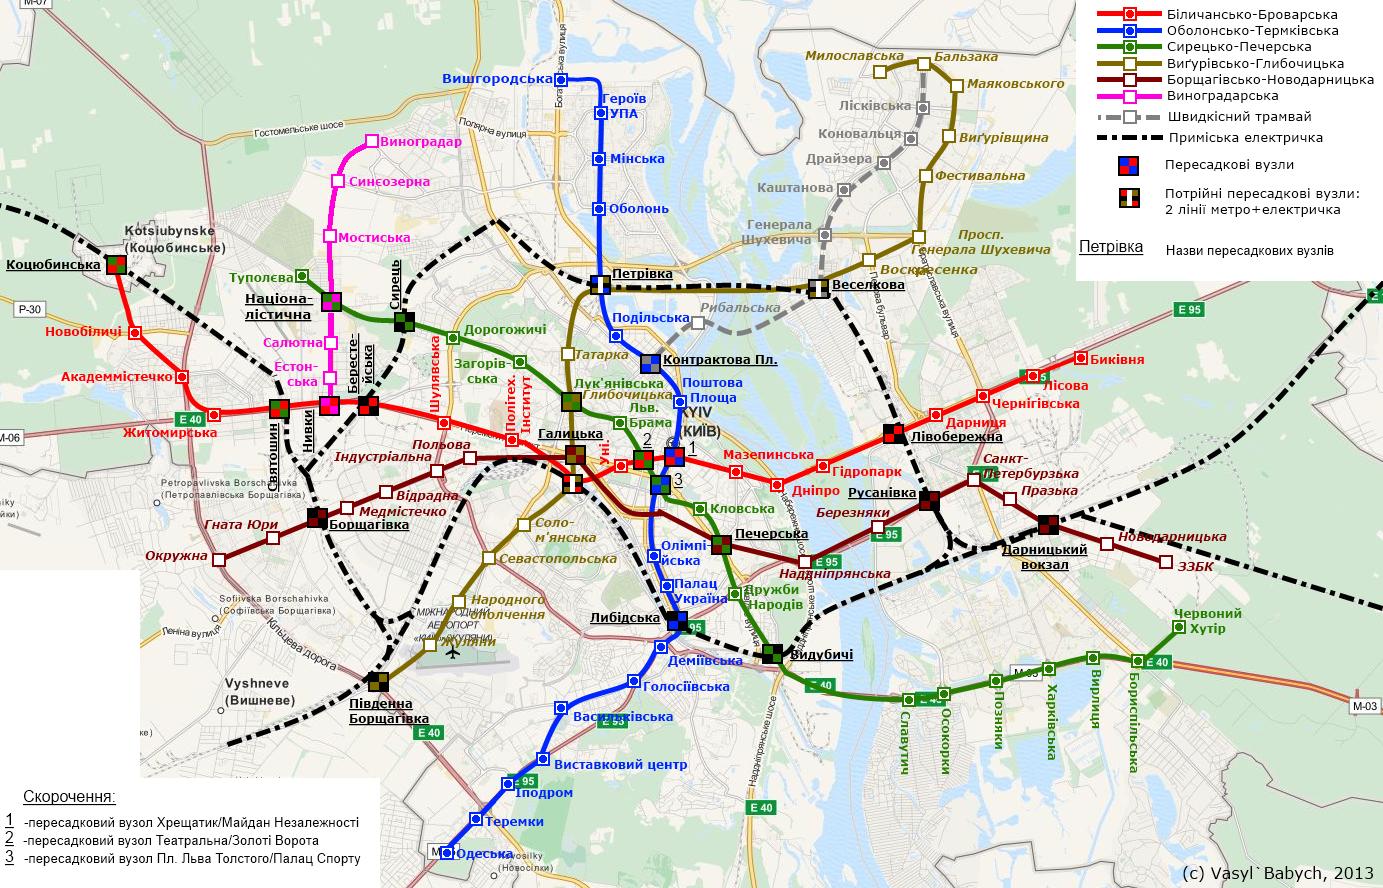 план схема подземного метро киев